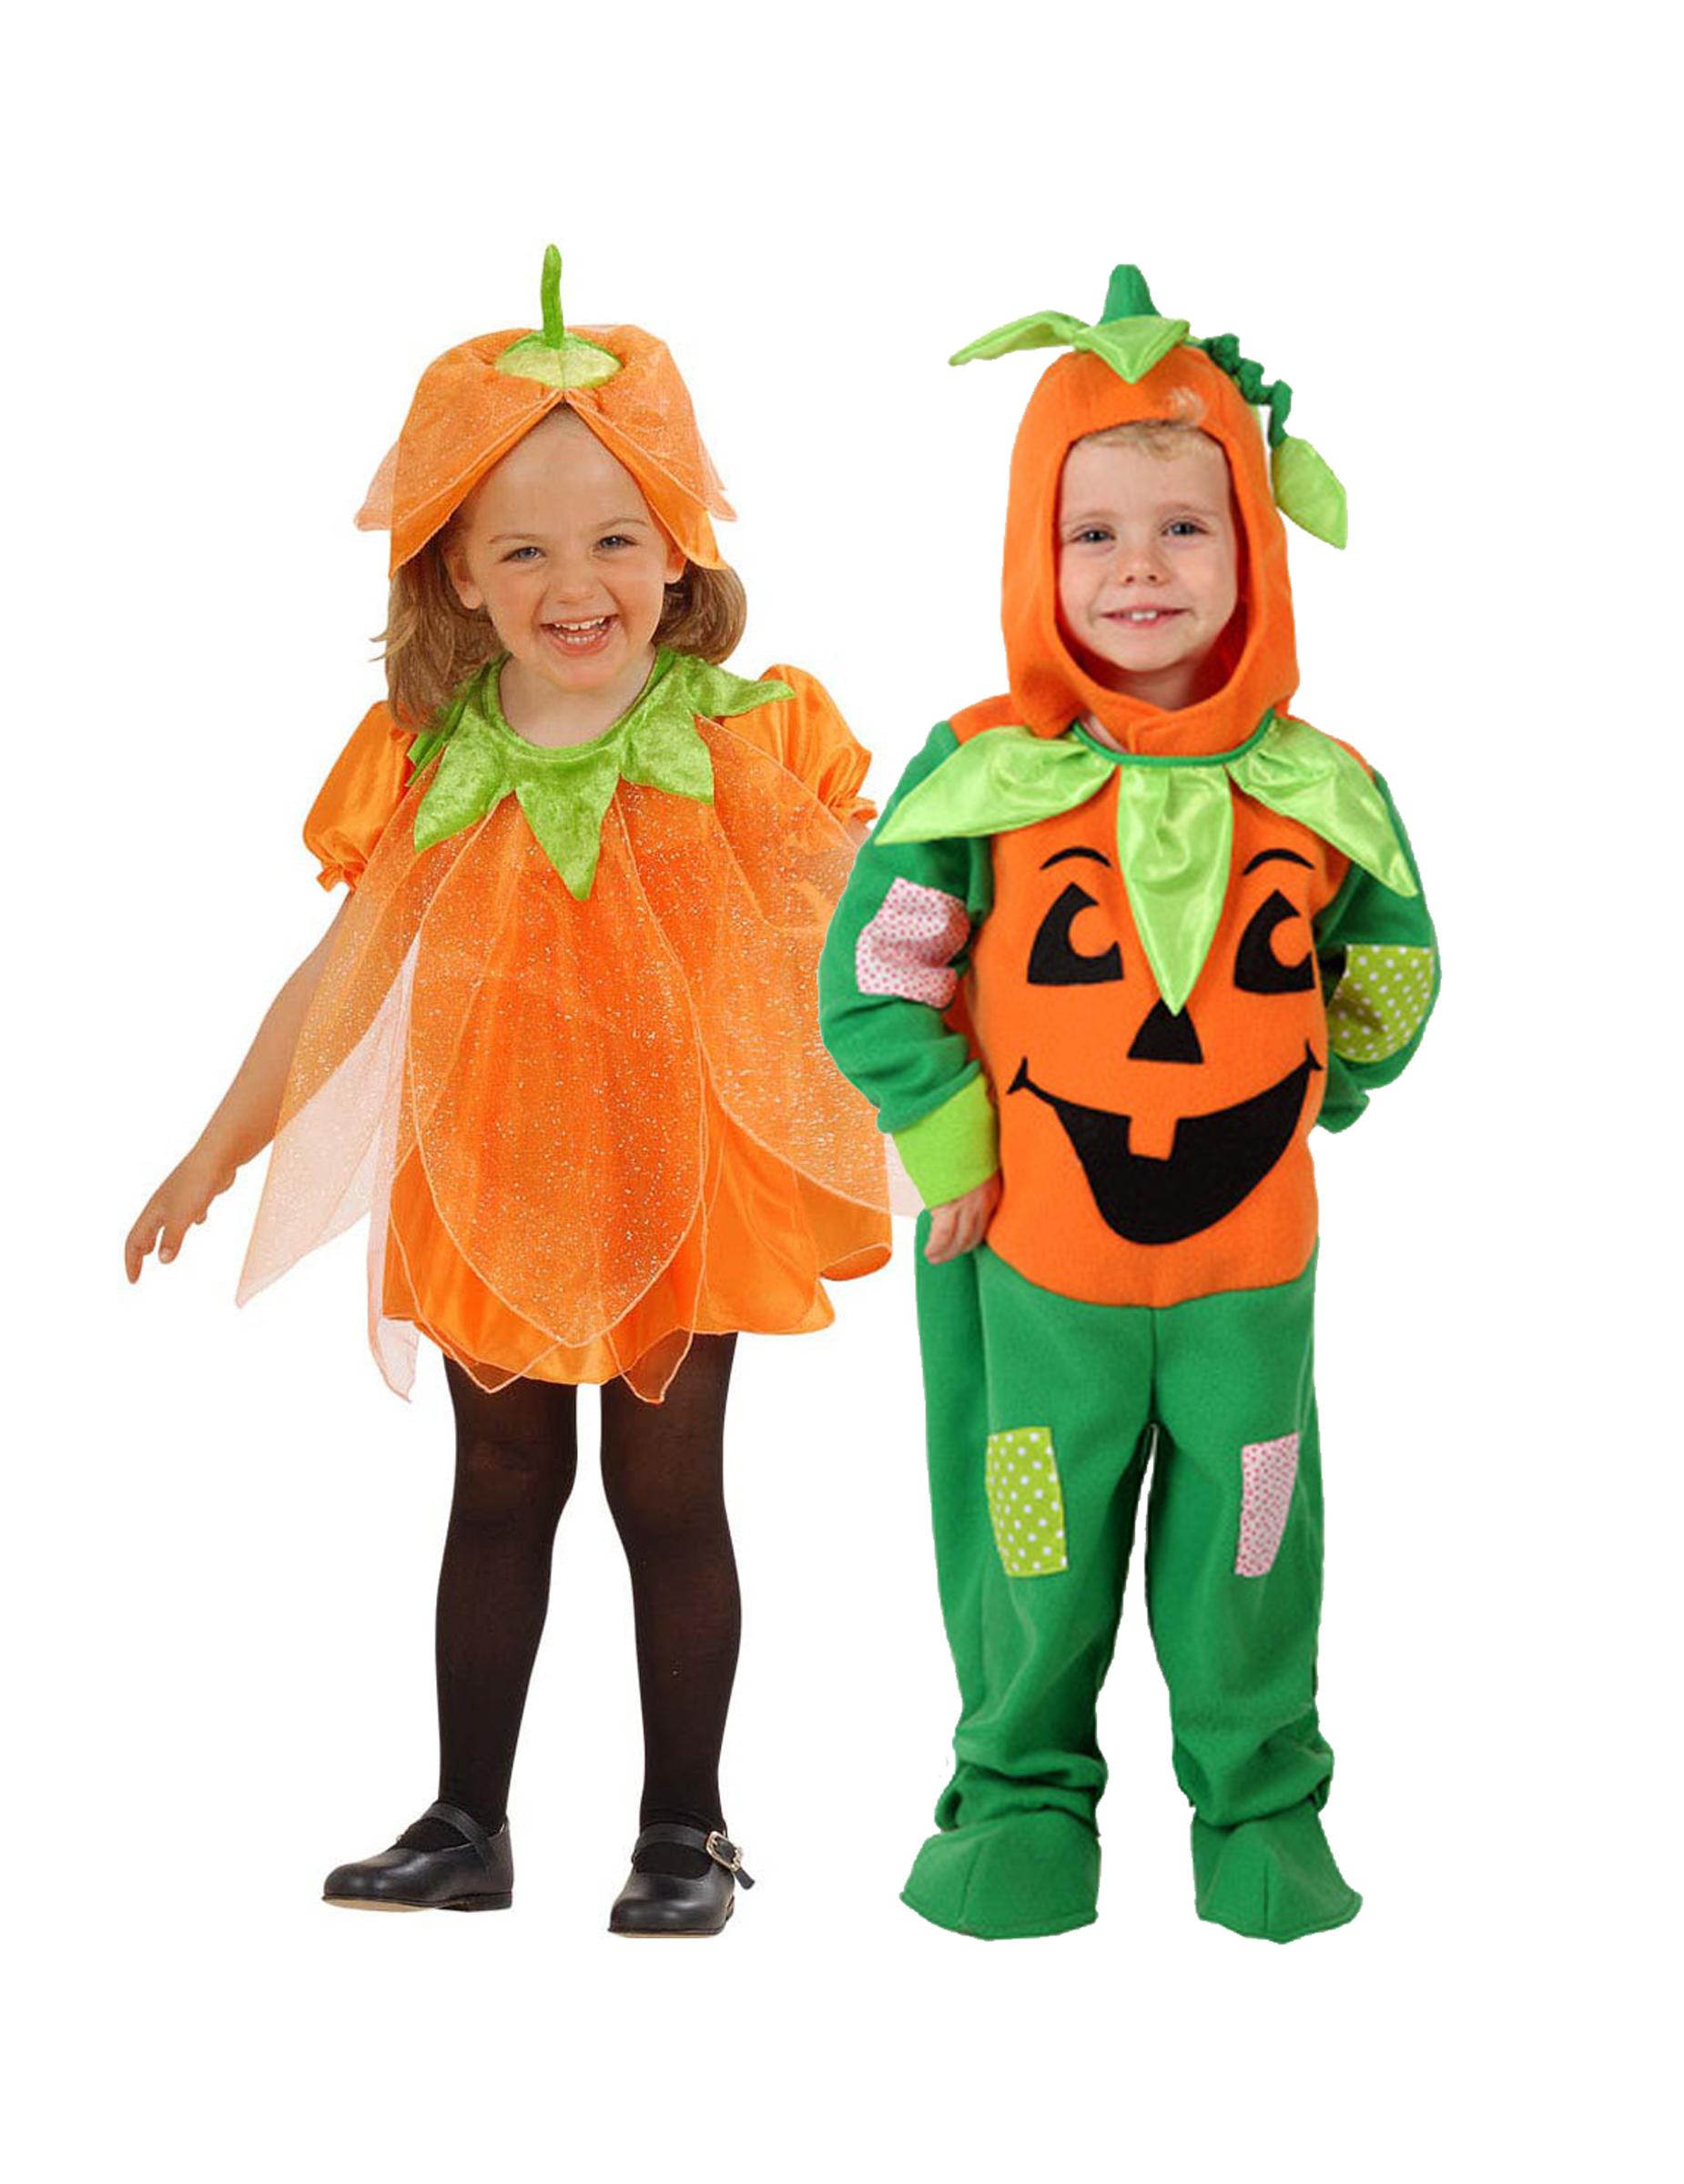 paarkost m k rbis f r kleinkinder halloween orange gr n. Black Bedroom Furniture Sets. Home Design Ideas